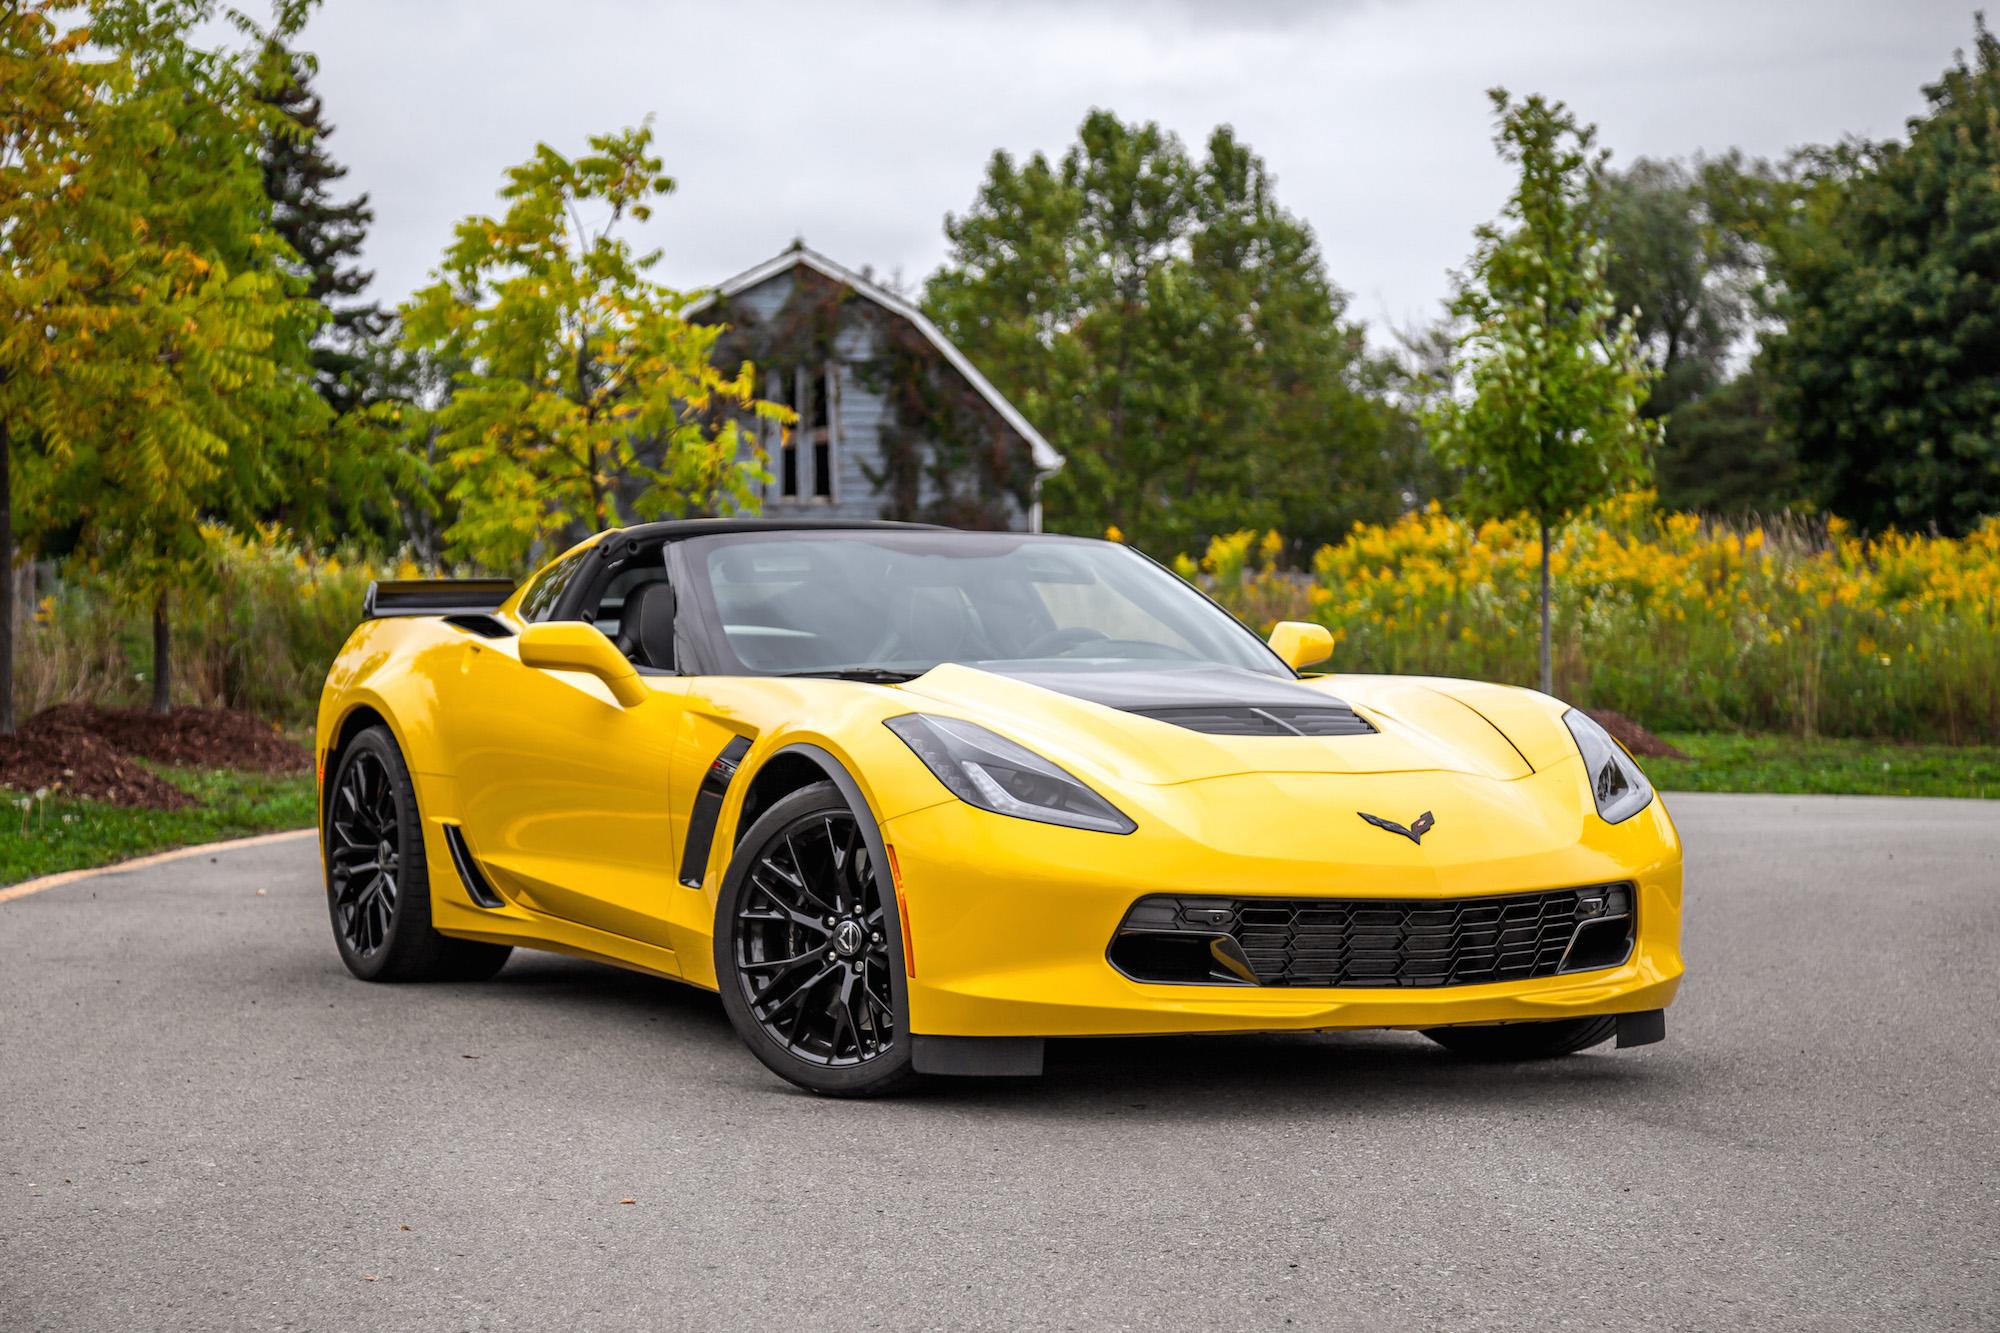 Review 2019 Chevrolet Corvette Z06 Car